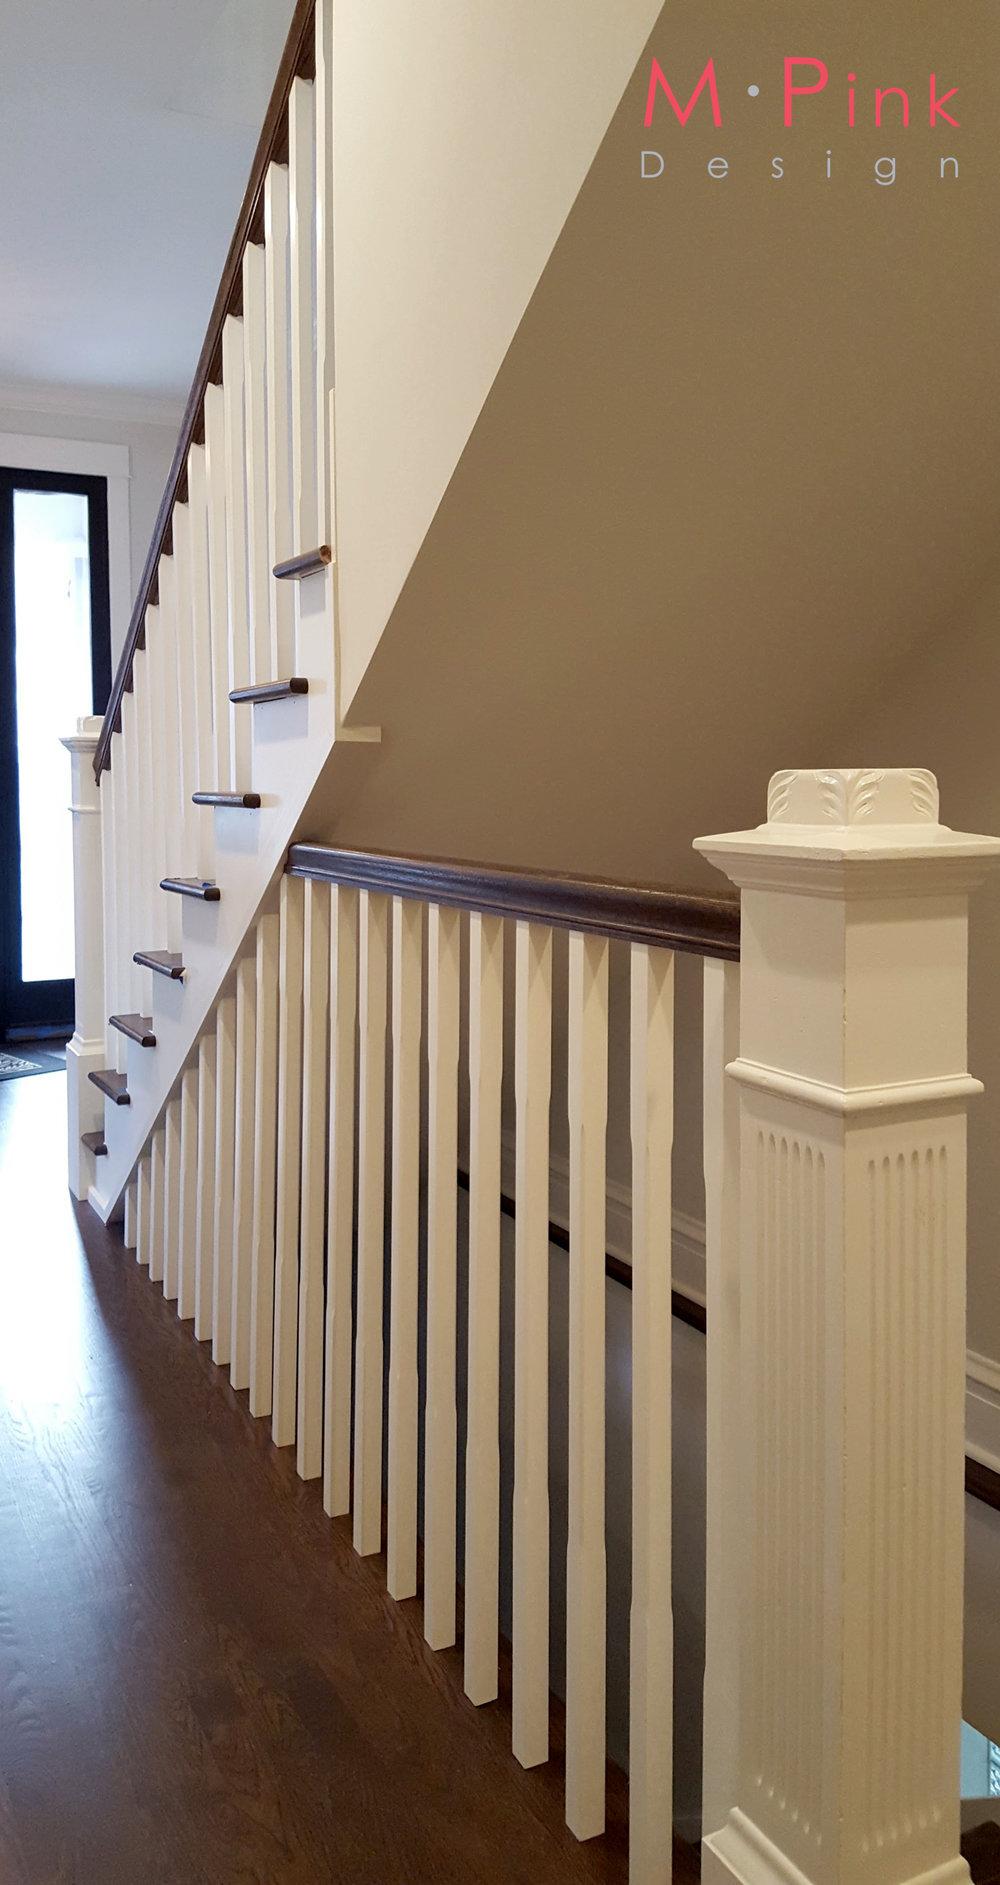 Stair rail detail. Repainted original newel posts.